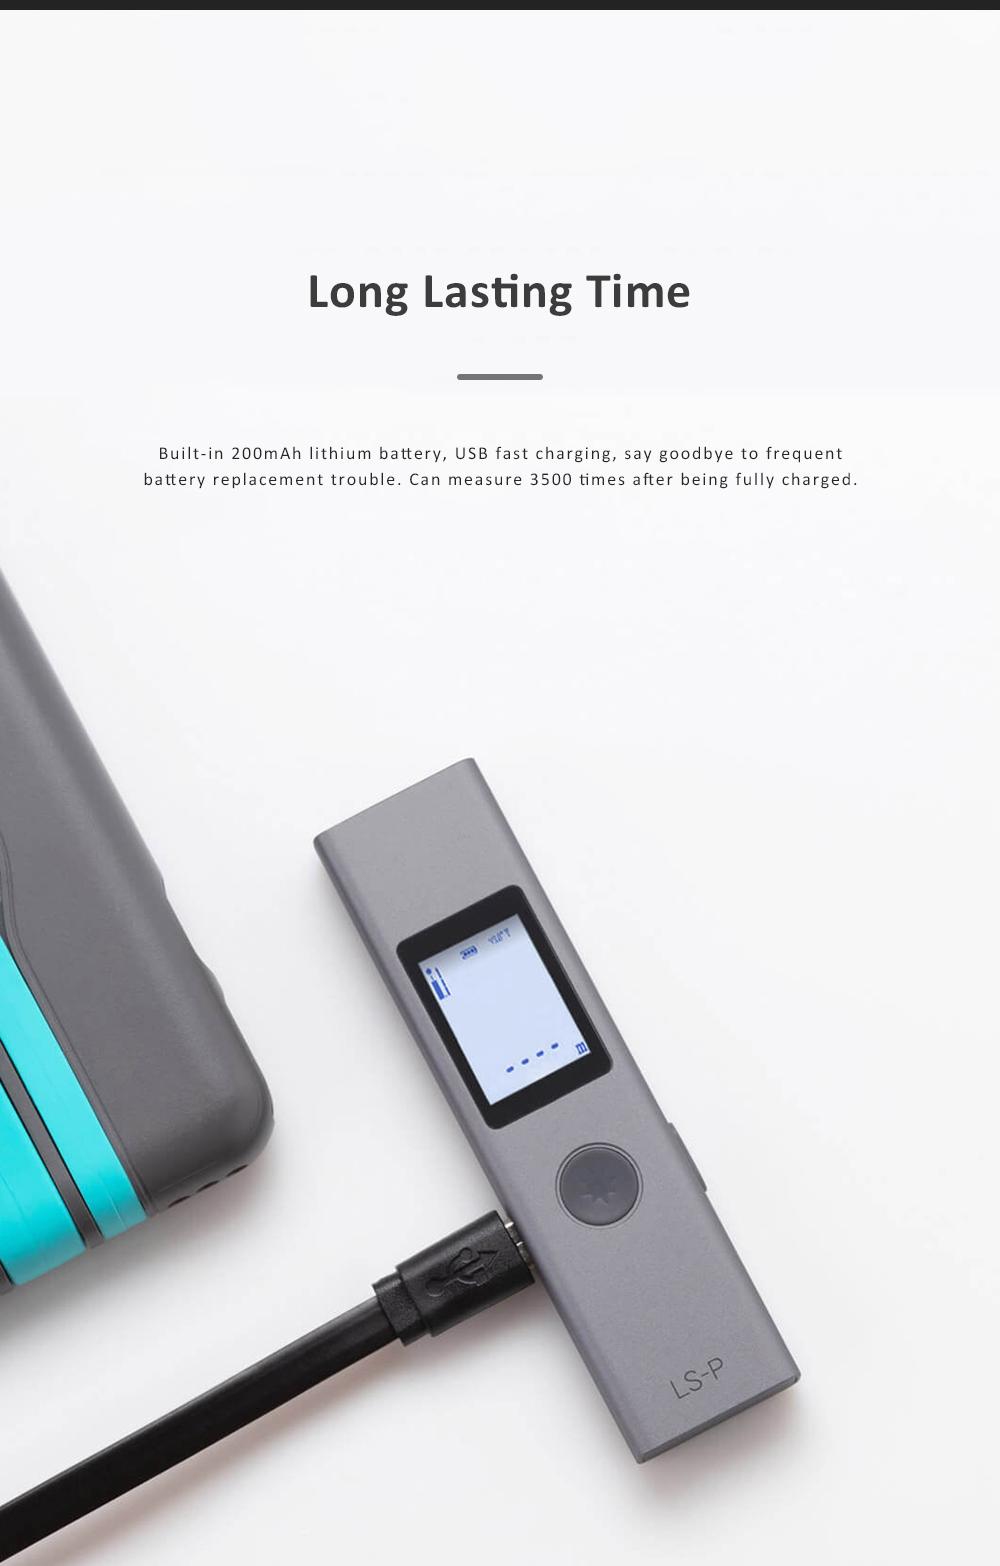 Xiaomi DUKA LS-P Laser Distance Rangefinder Mini Hand-held Digital Distance Meter with 200mAh Battery for Distance Area Volume Measurement 4